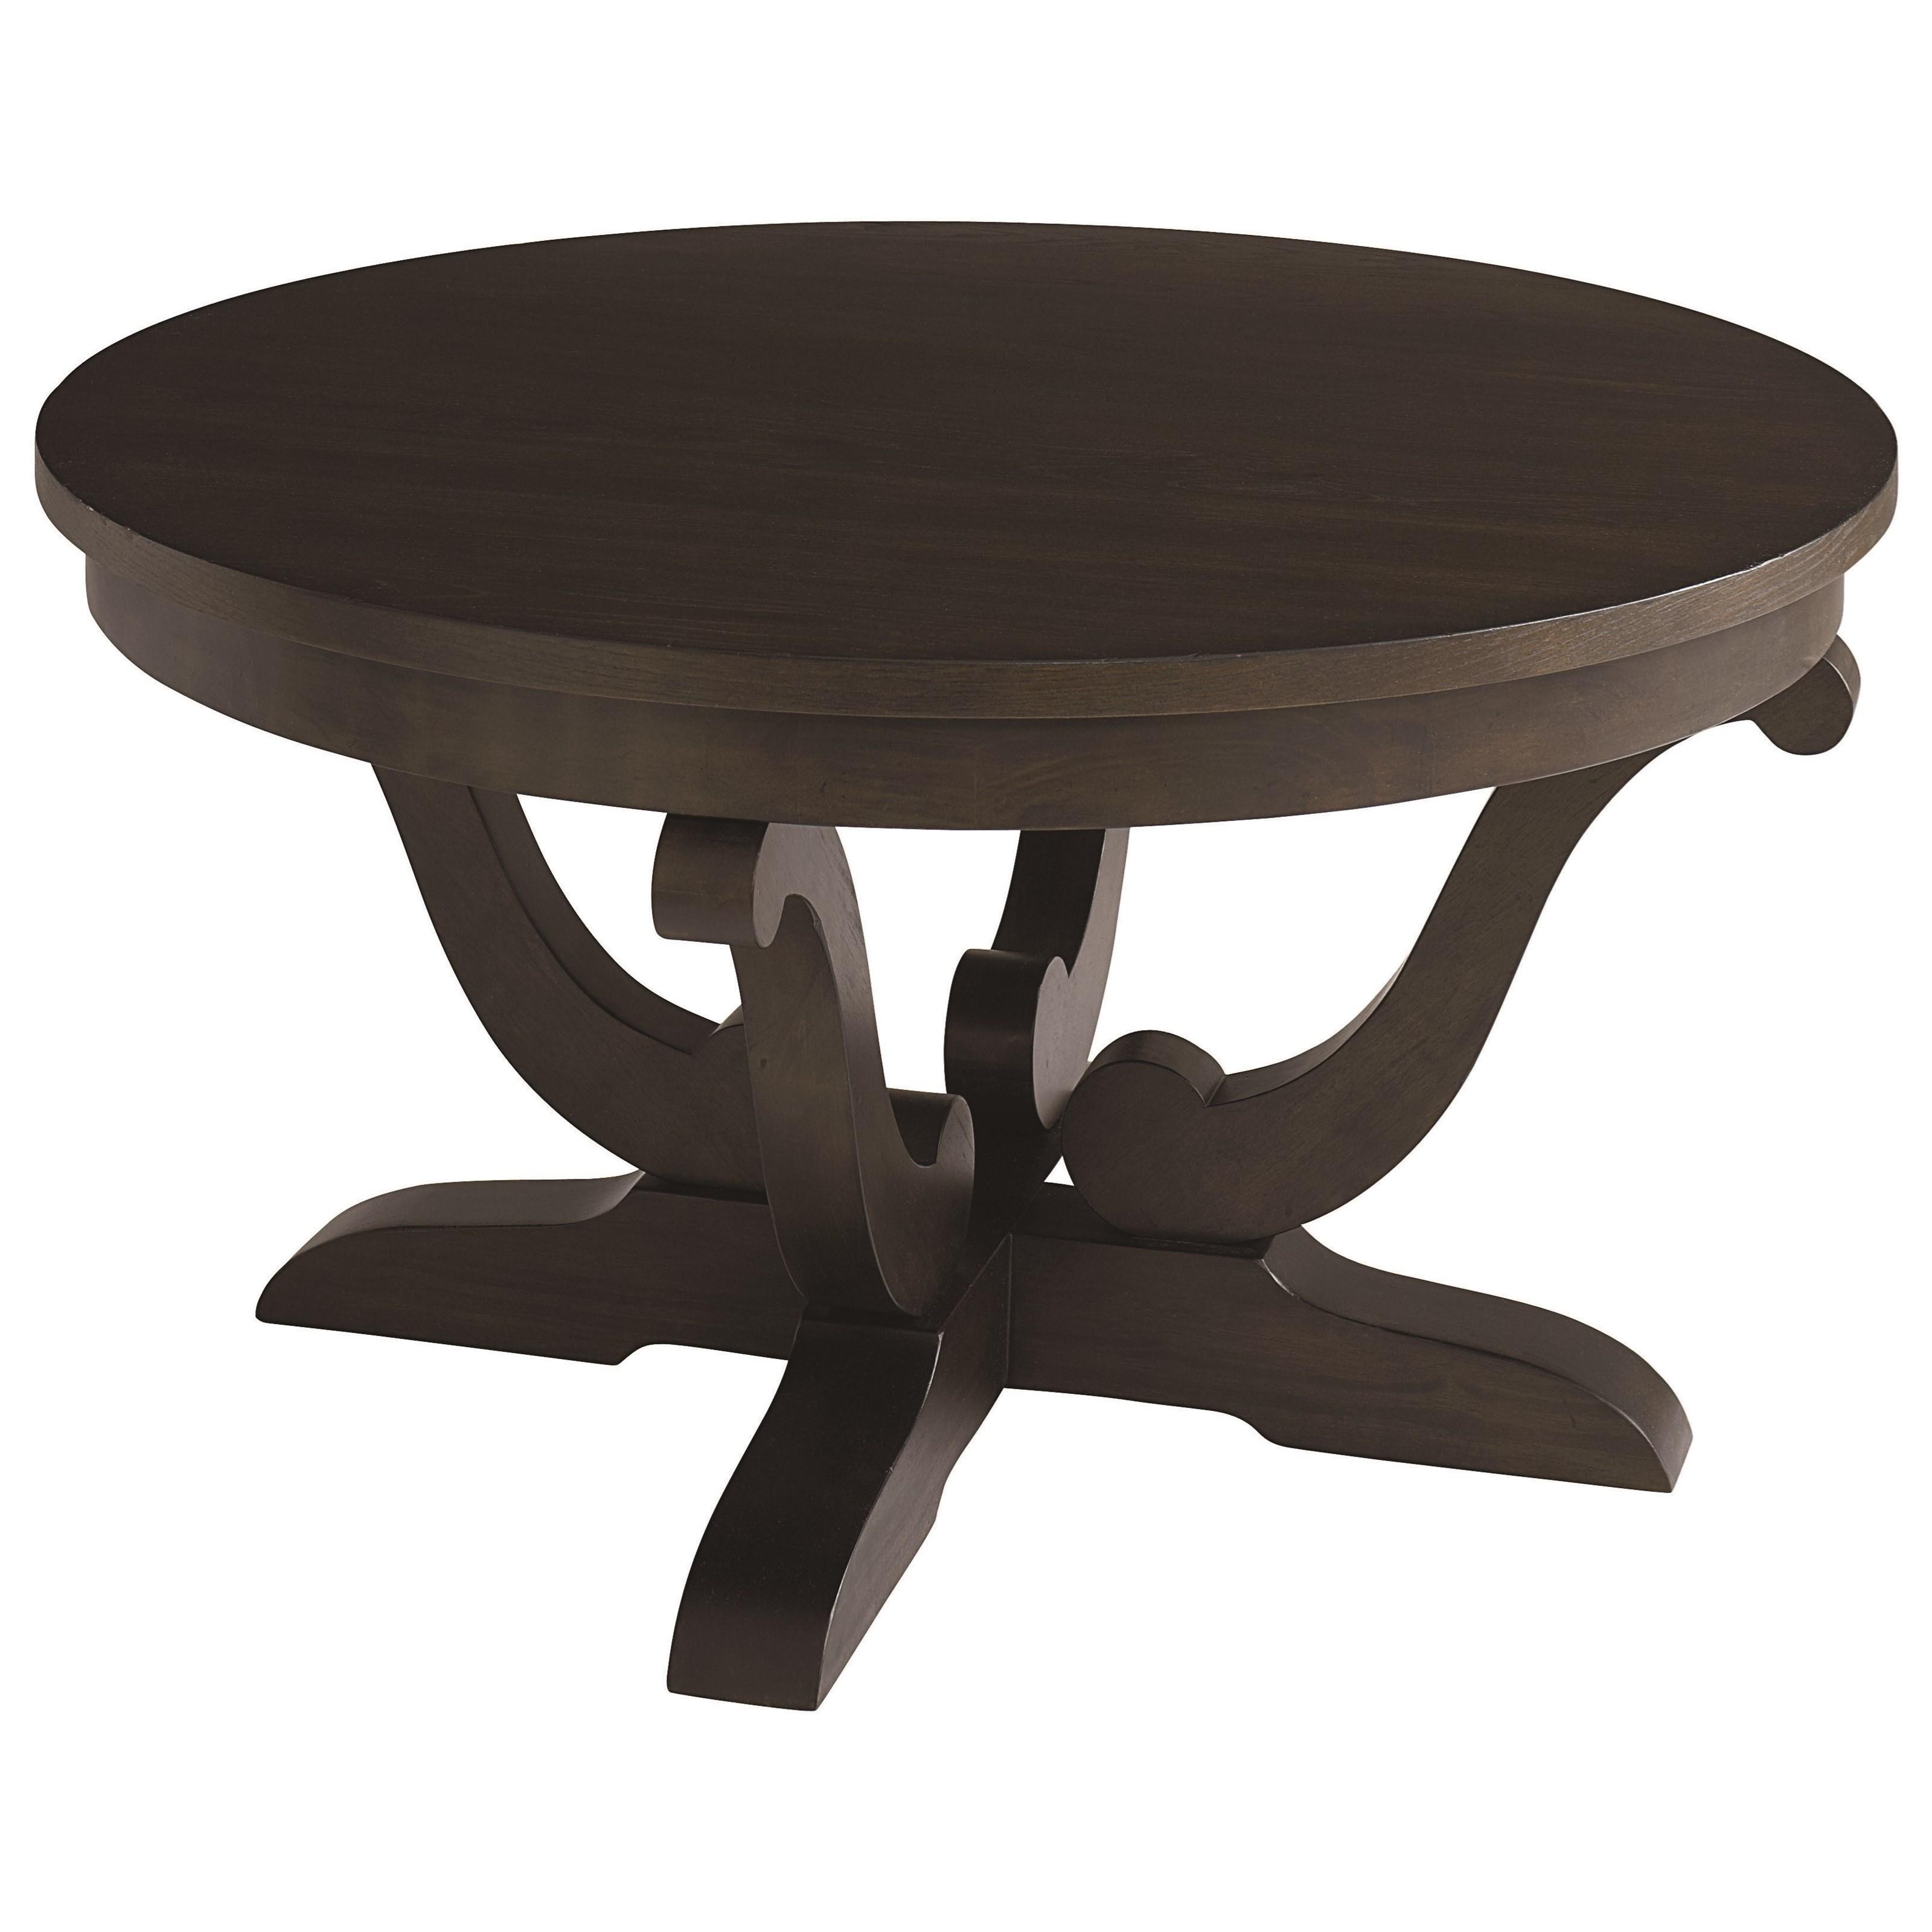 Bassett Oval Coffee Table Bassett Mirror Avery Dining Table 54